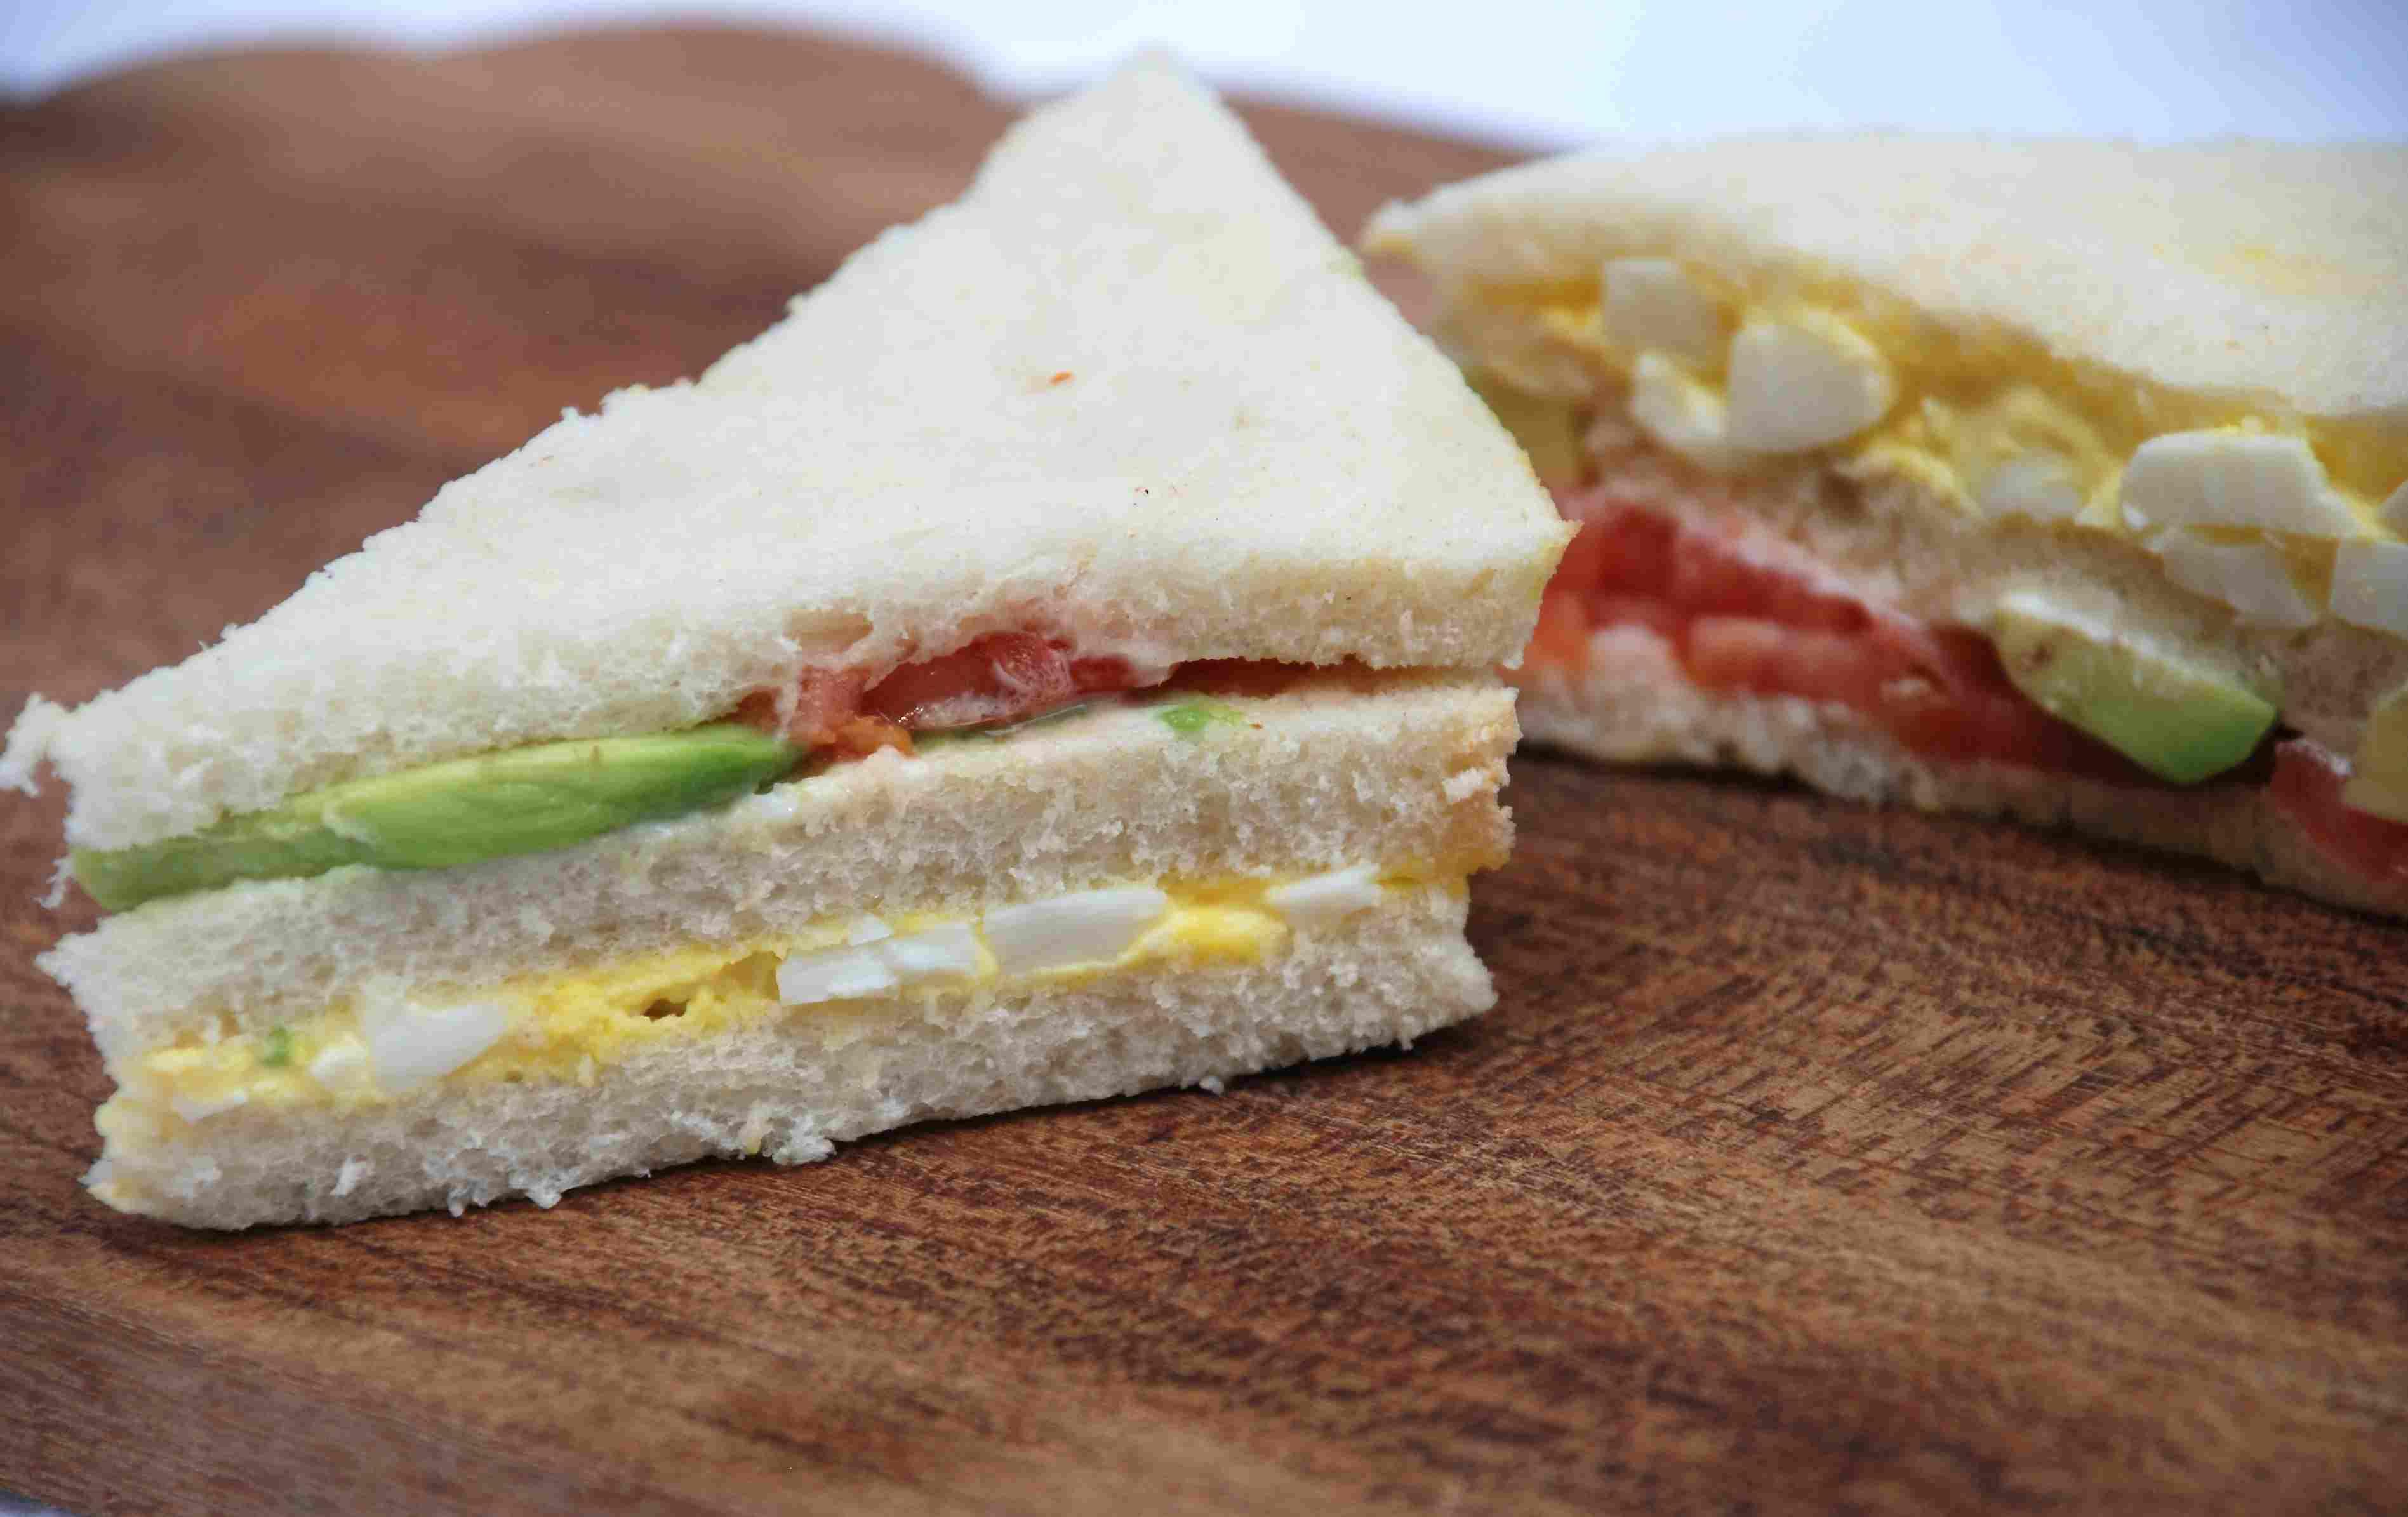 Peruvian sandwich